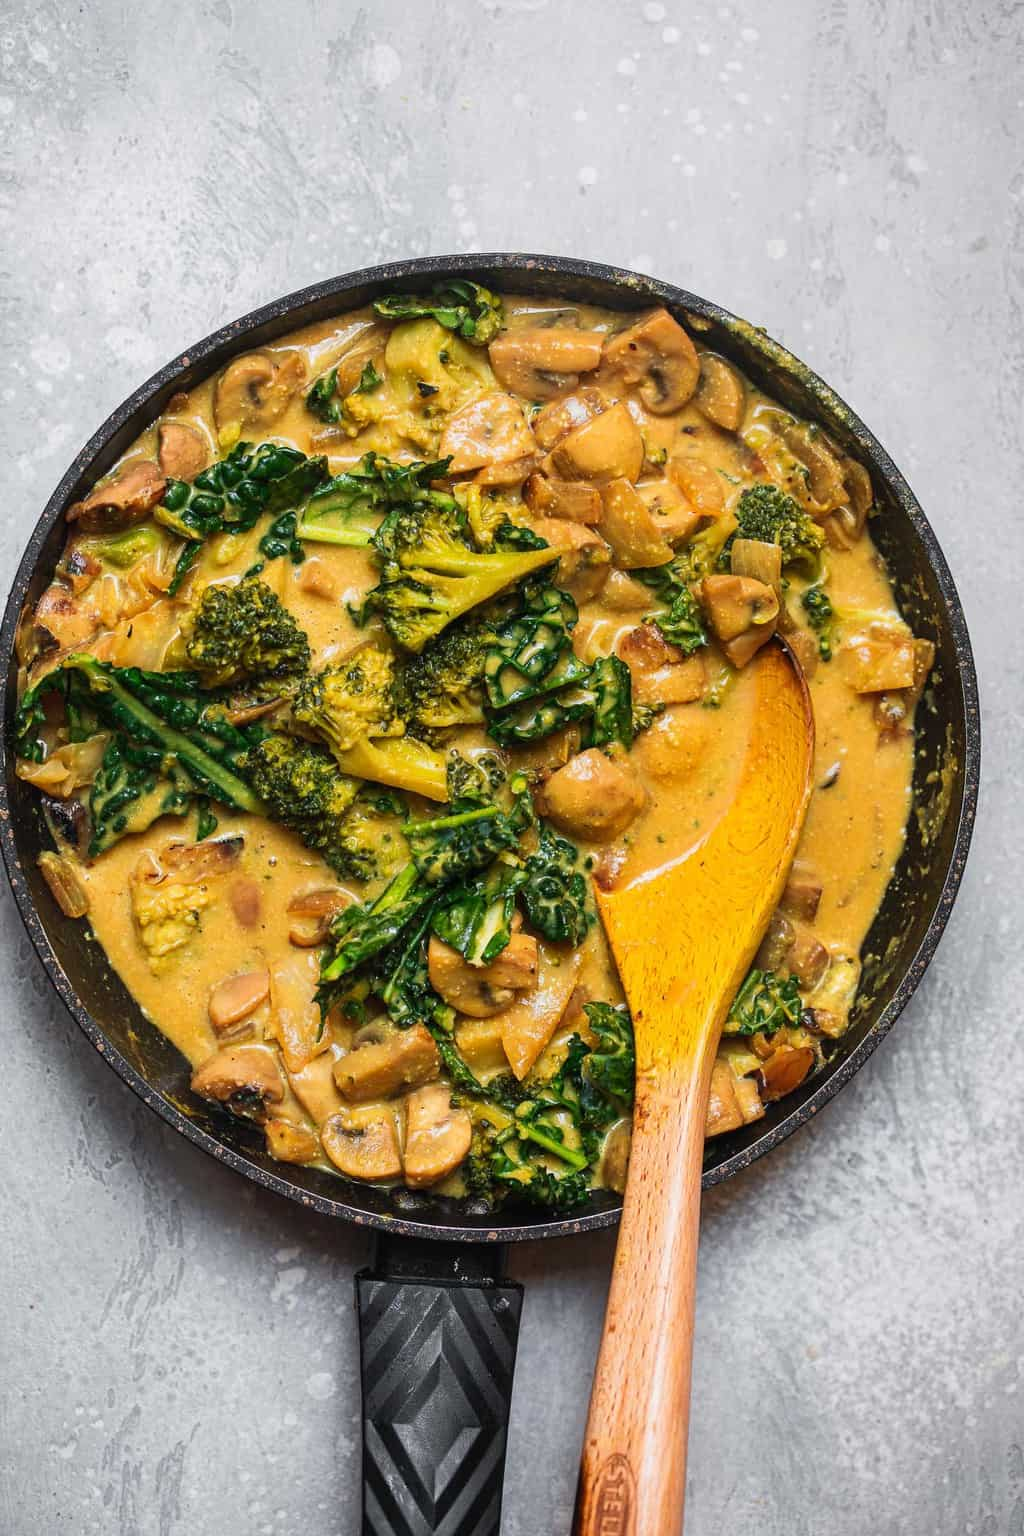 Vegan gluten-free broccoli cheese soup in a saucepan